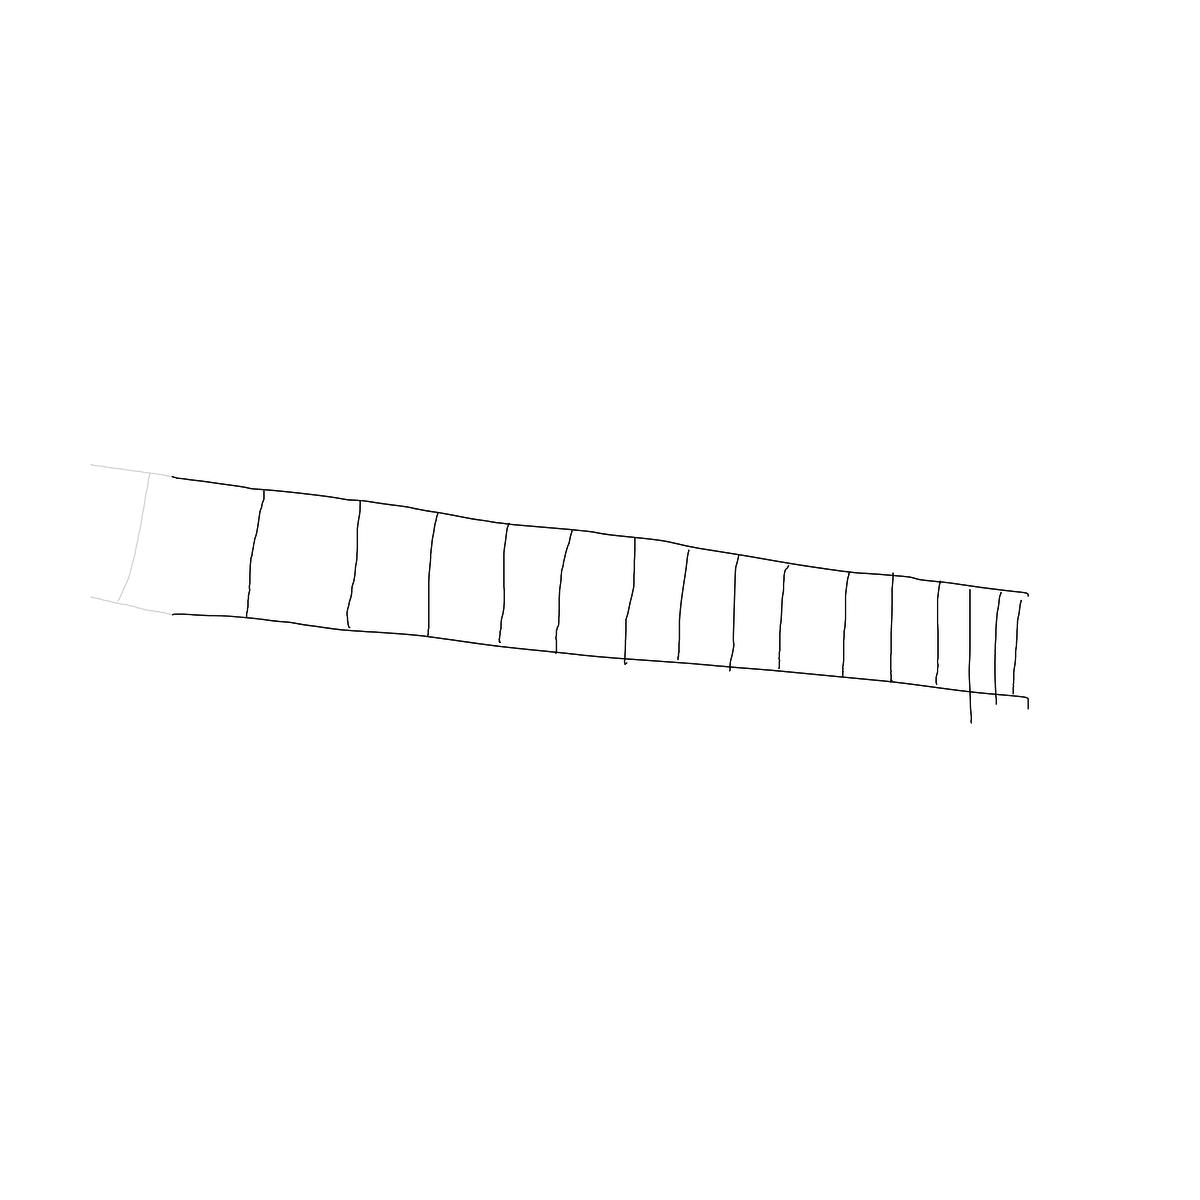 BAAAM drawing#23560 lat:66.0171279907226600lng: -169.7067565917968800